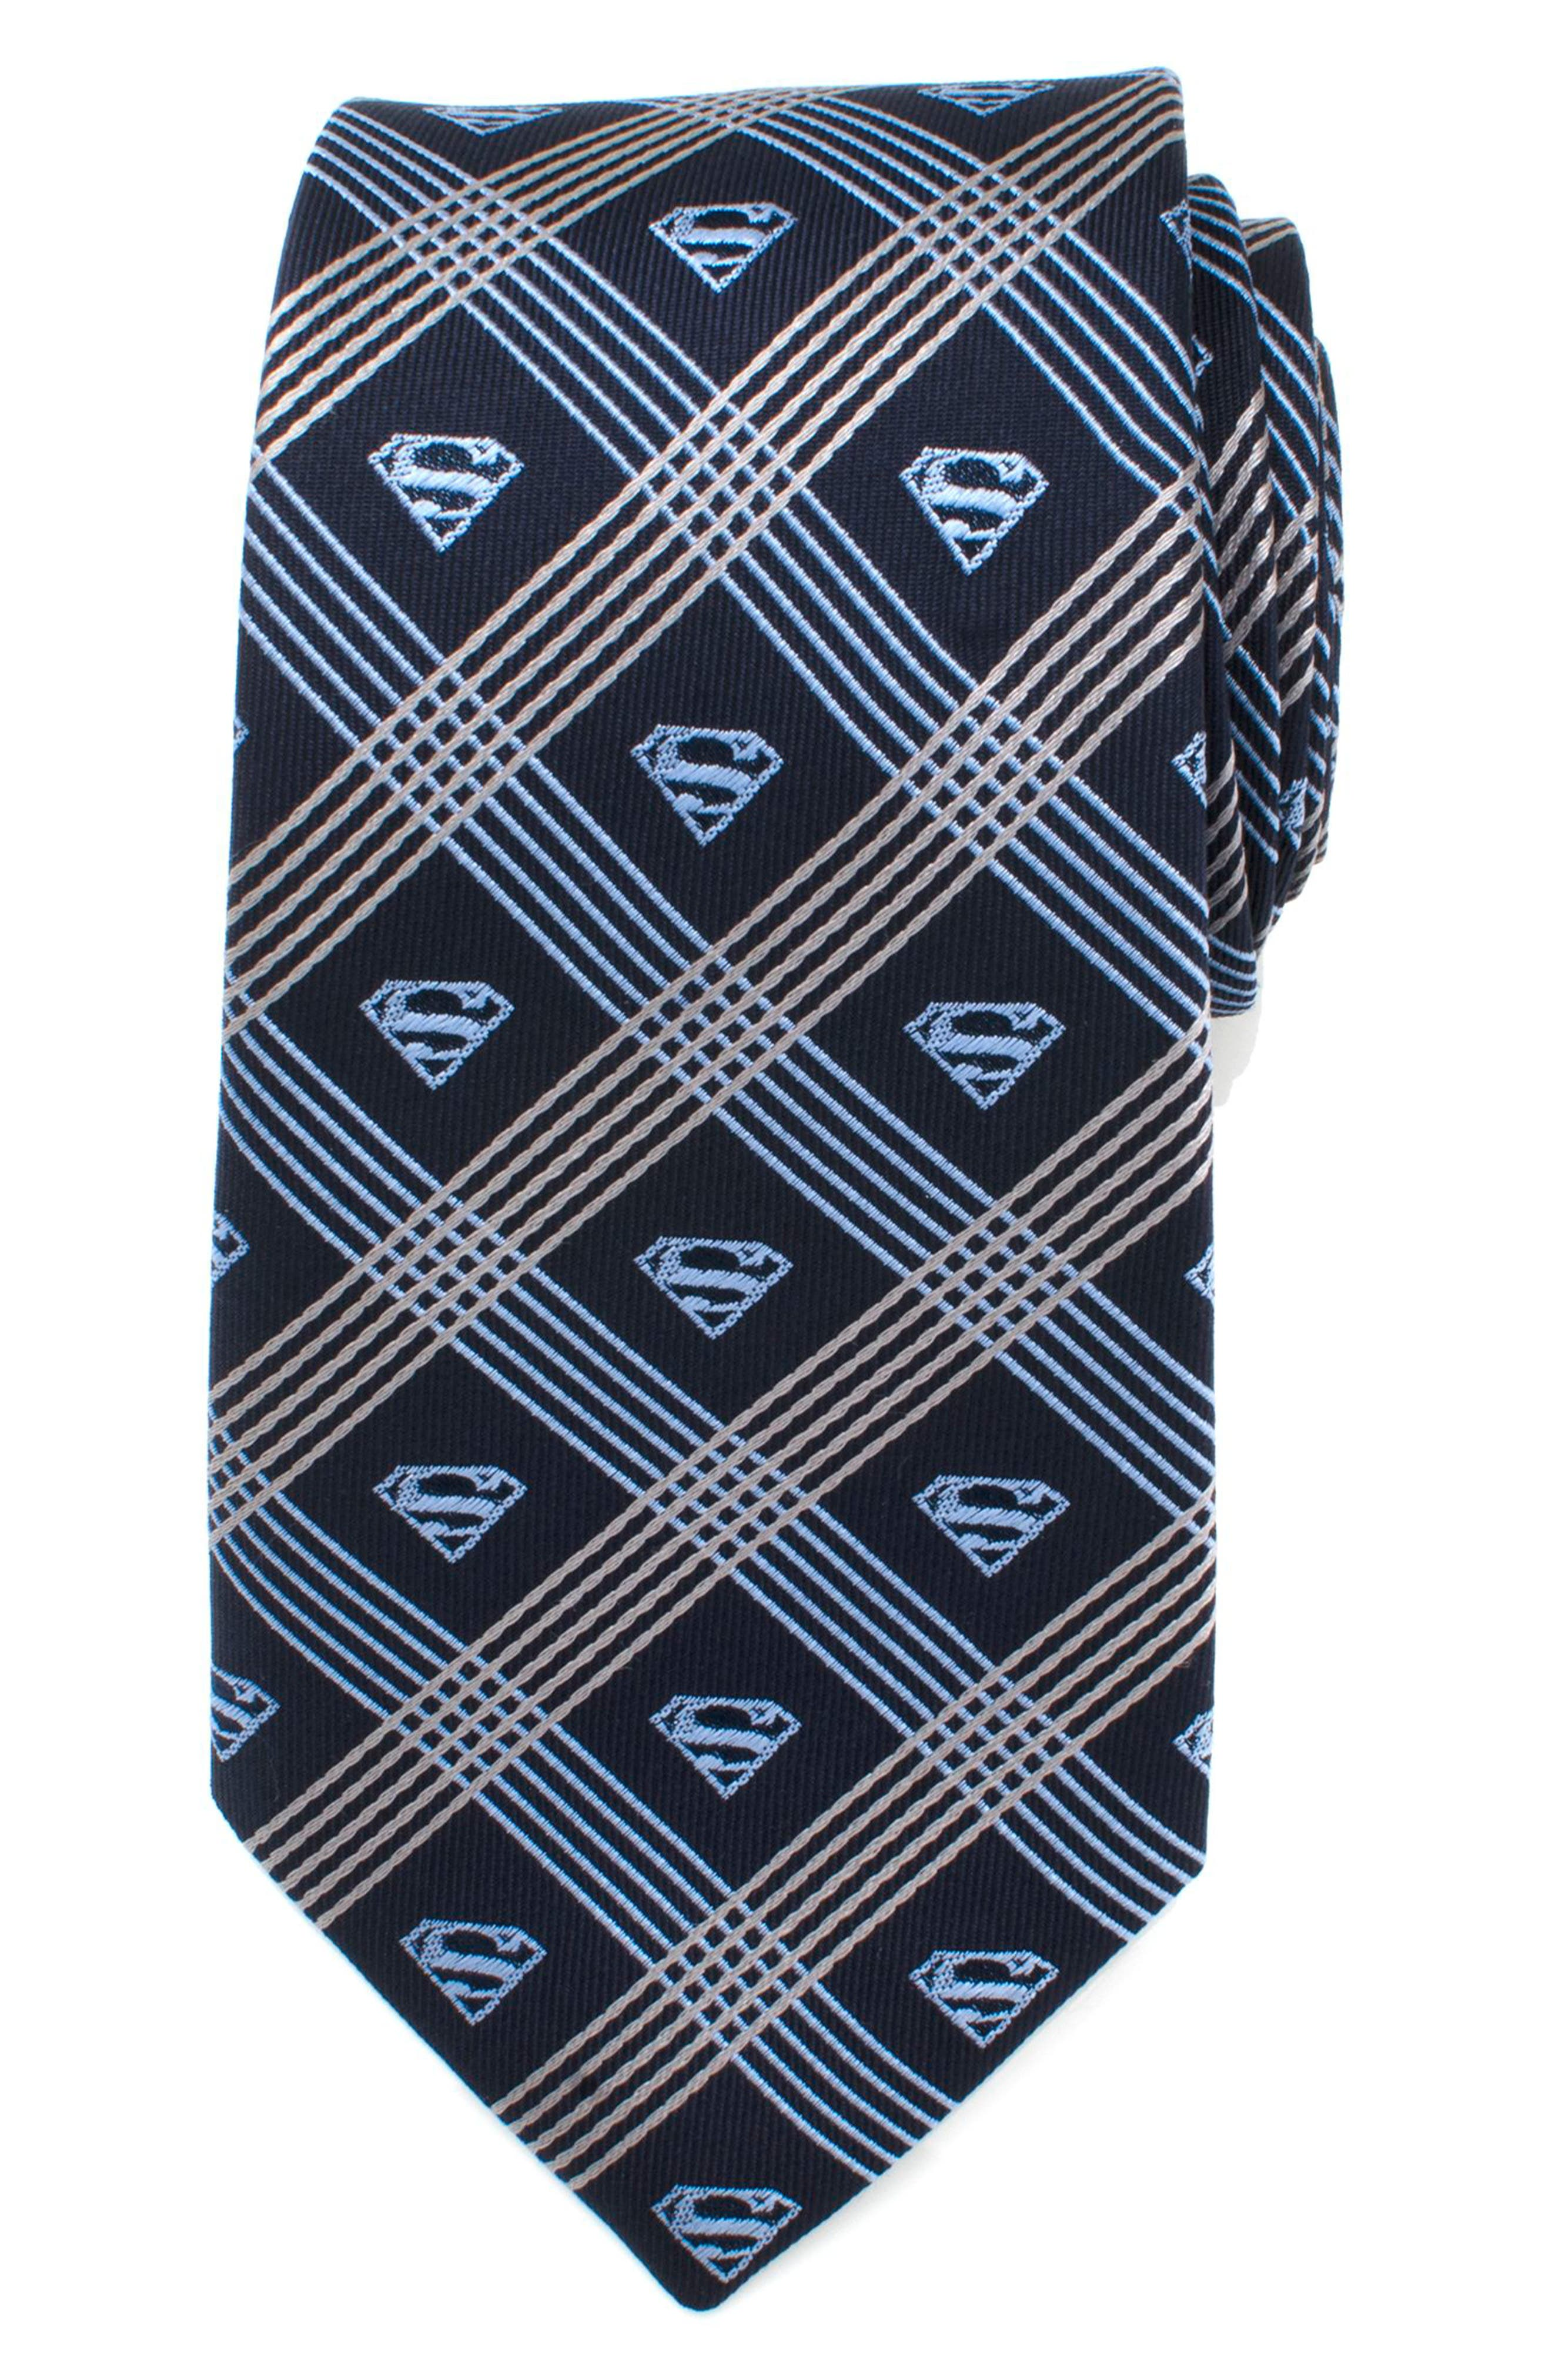 Superman Shield Silk Tie,                             Main thumbnail 1, color,                             020